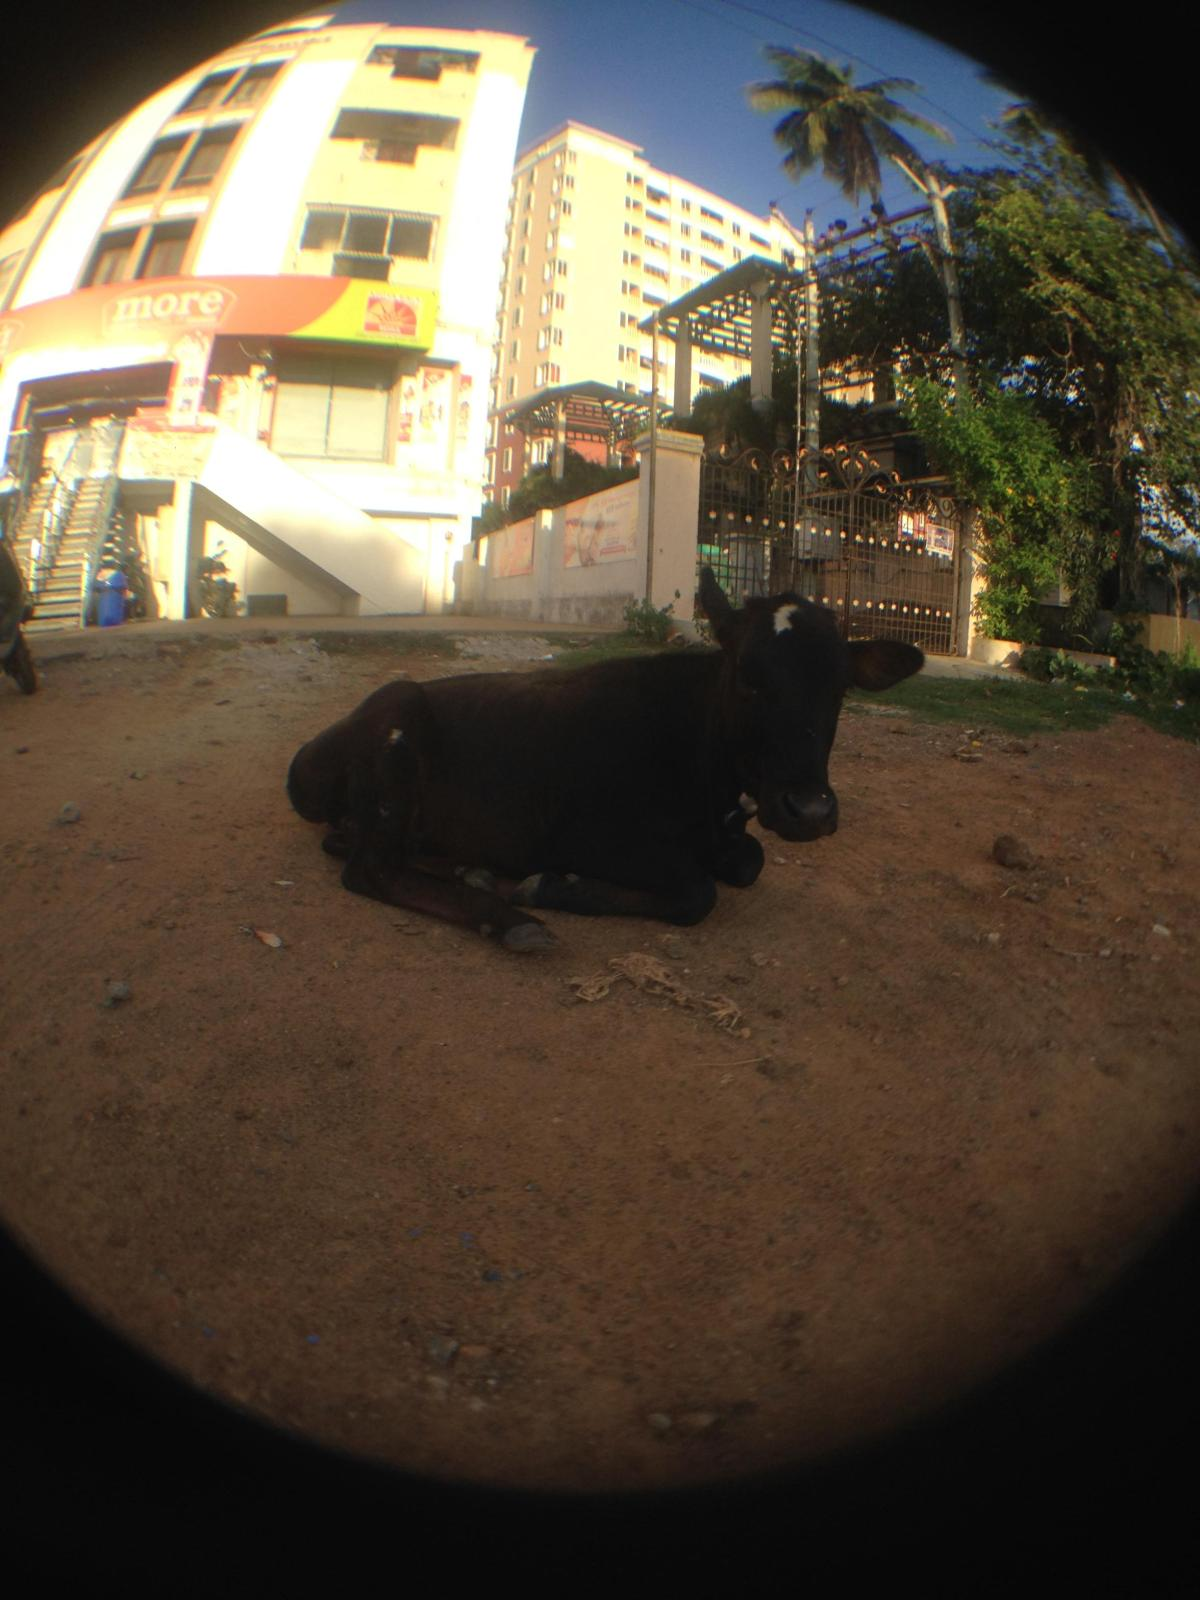 Chennai, India — By Jennifer Shipp